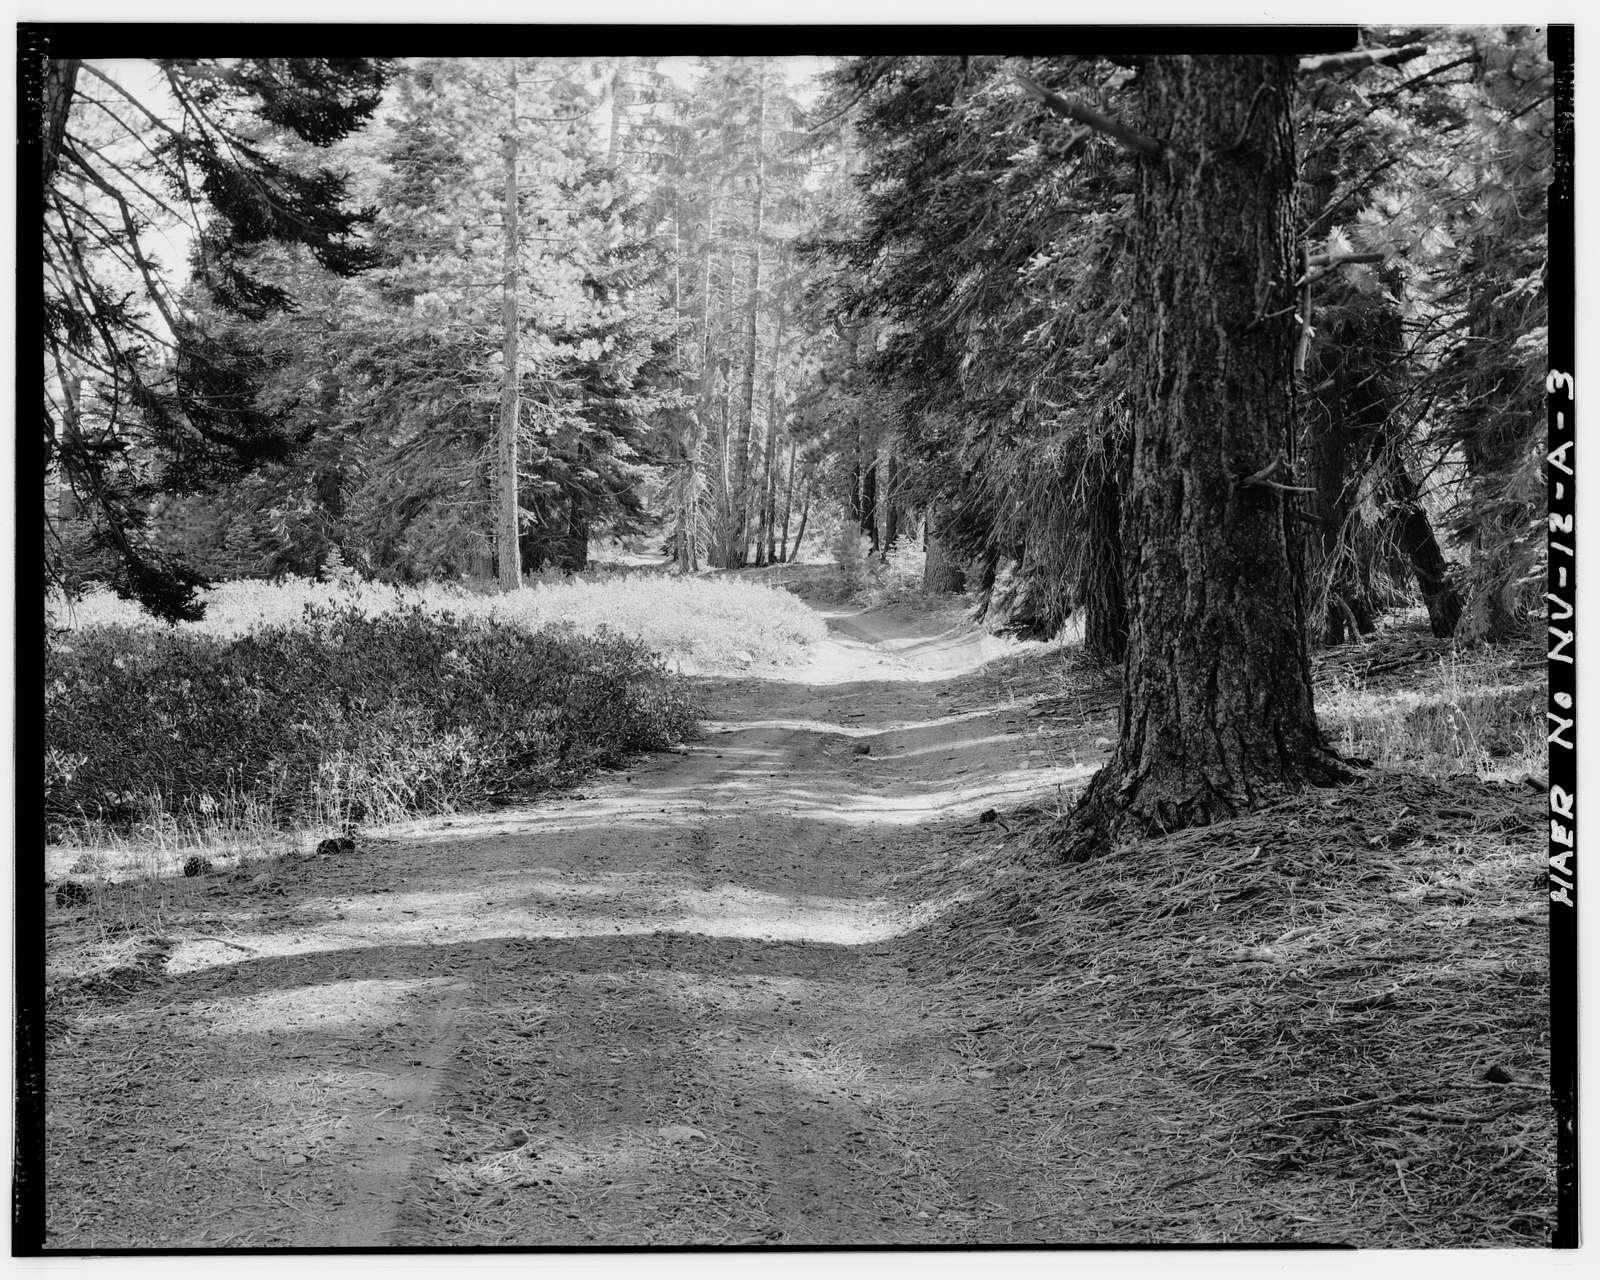 Genoa Peak Road, Spur, Glenbrook, Douglas County, NV